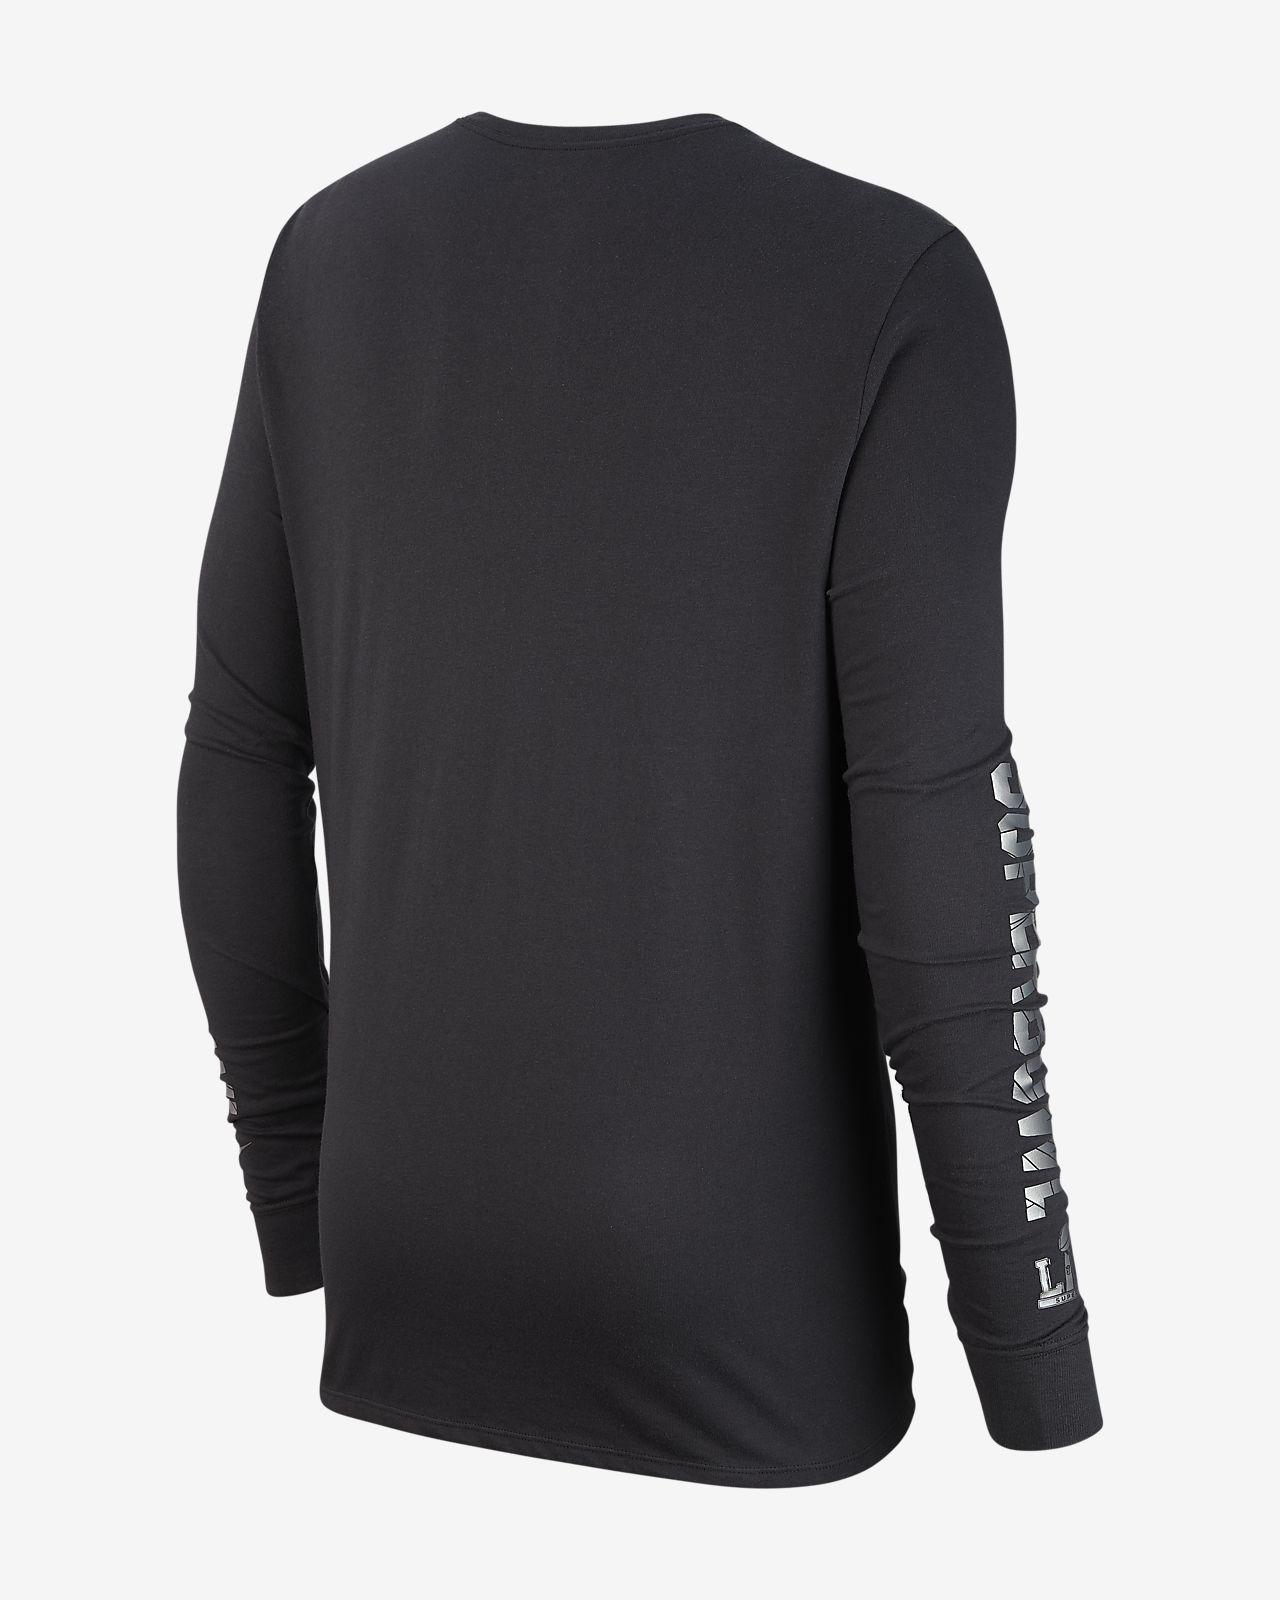 67eef61a5e Nike Dri-FIT Super Bowl LIII (NFL Rams) Men's Long-Sleeve T-Shirt